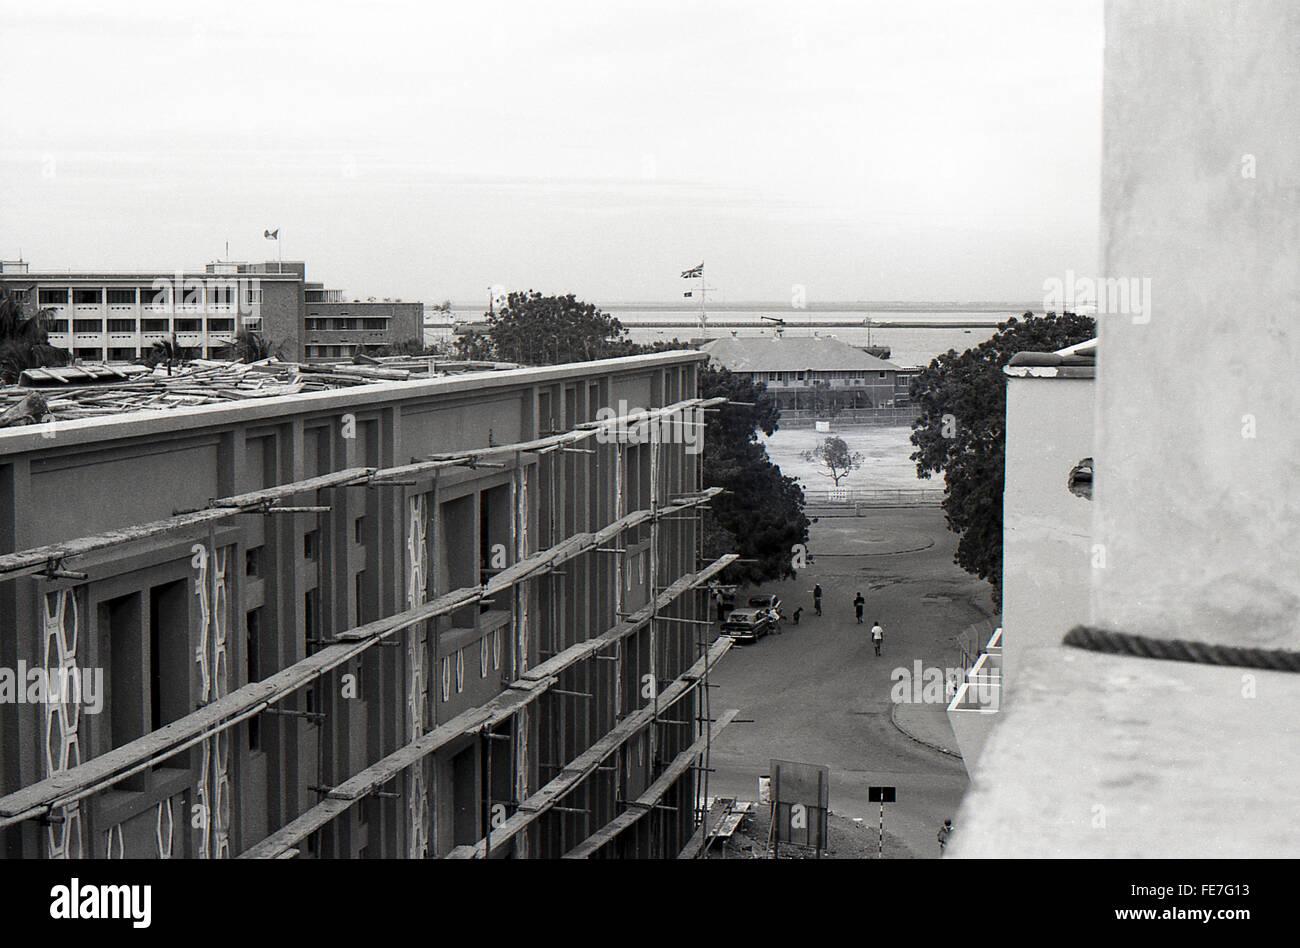 Street scene Aden Yemen 1967 British withdrawal - Stock Image